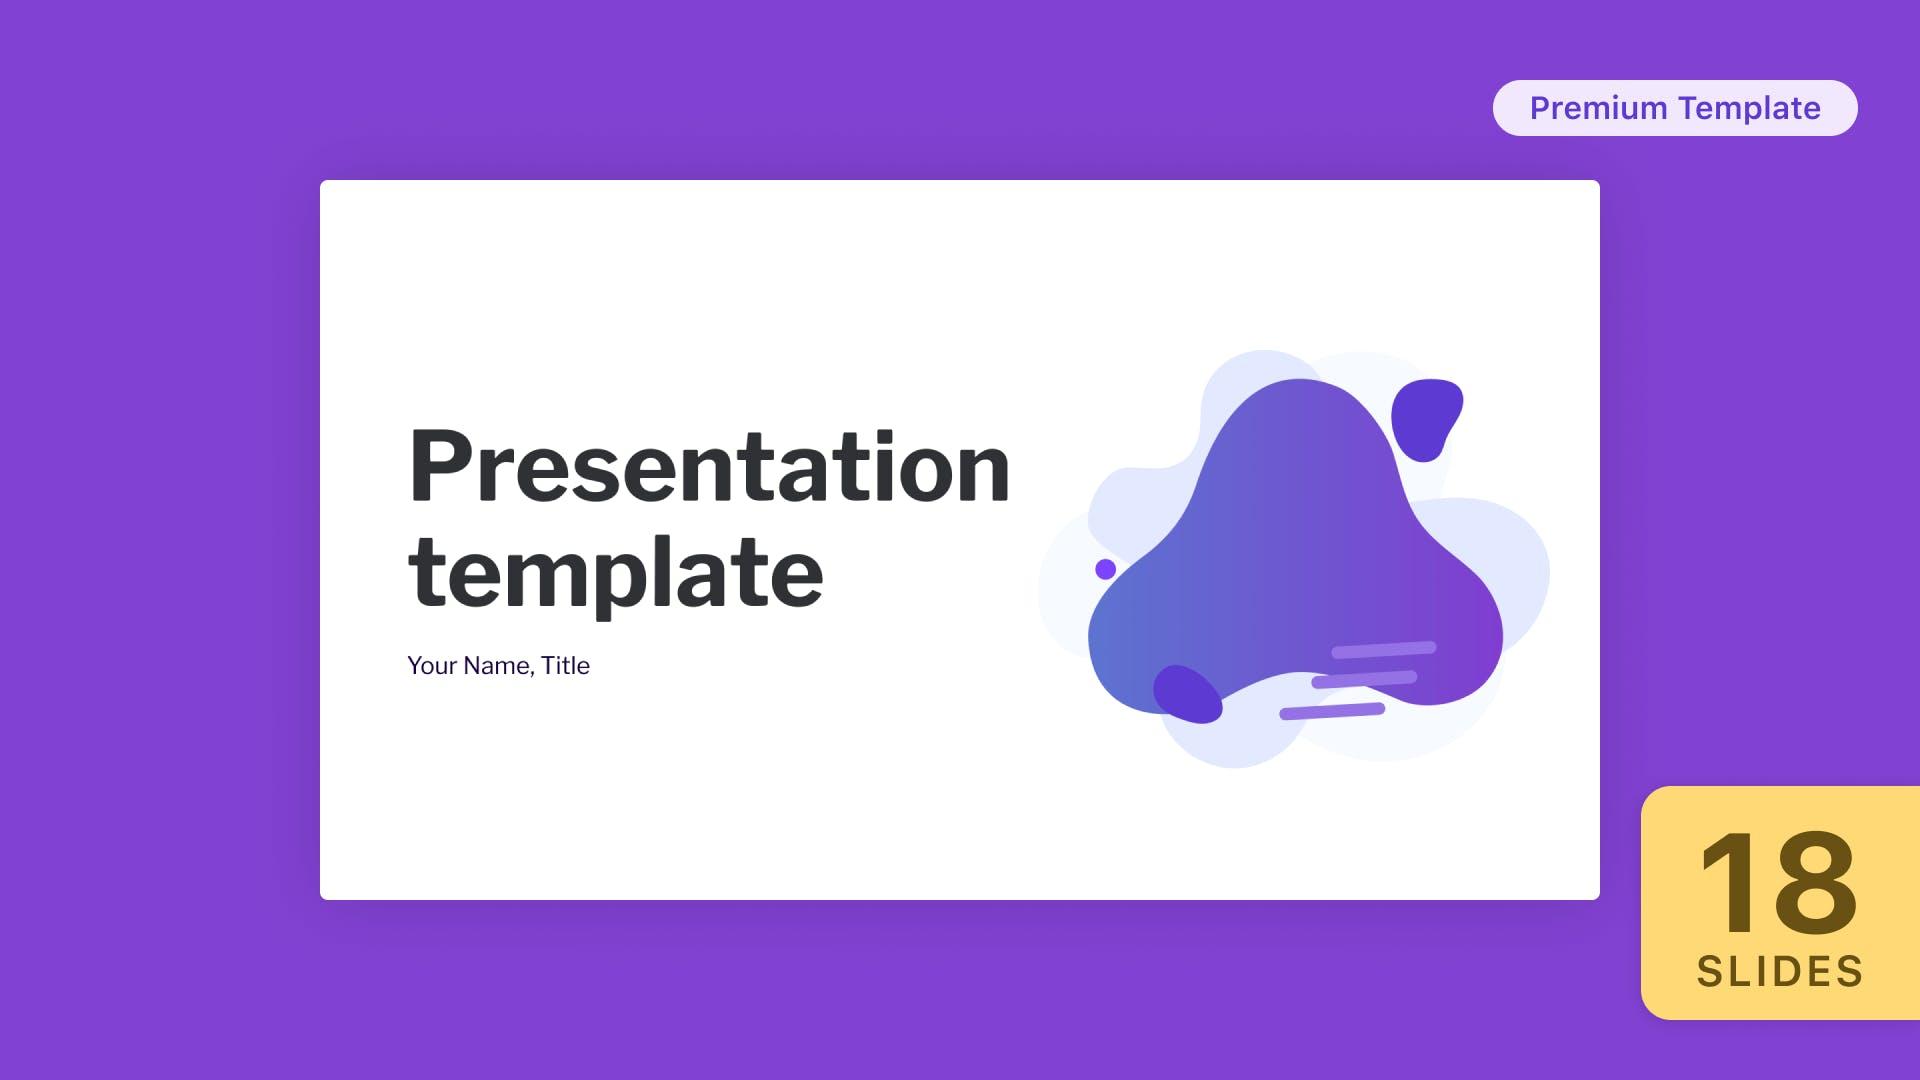 Pupa Presentation Template